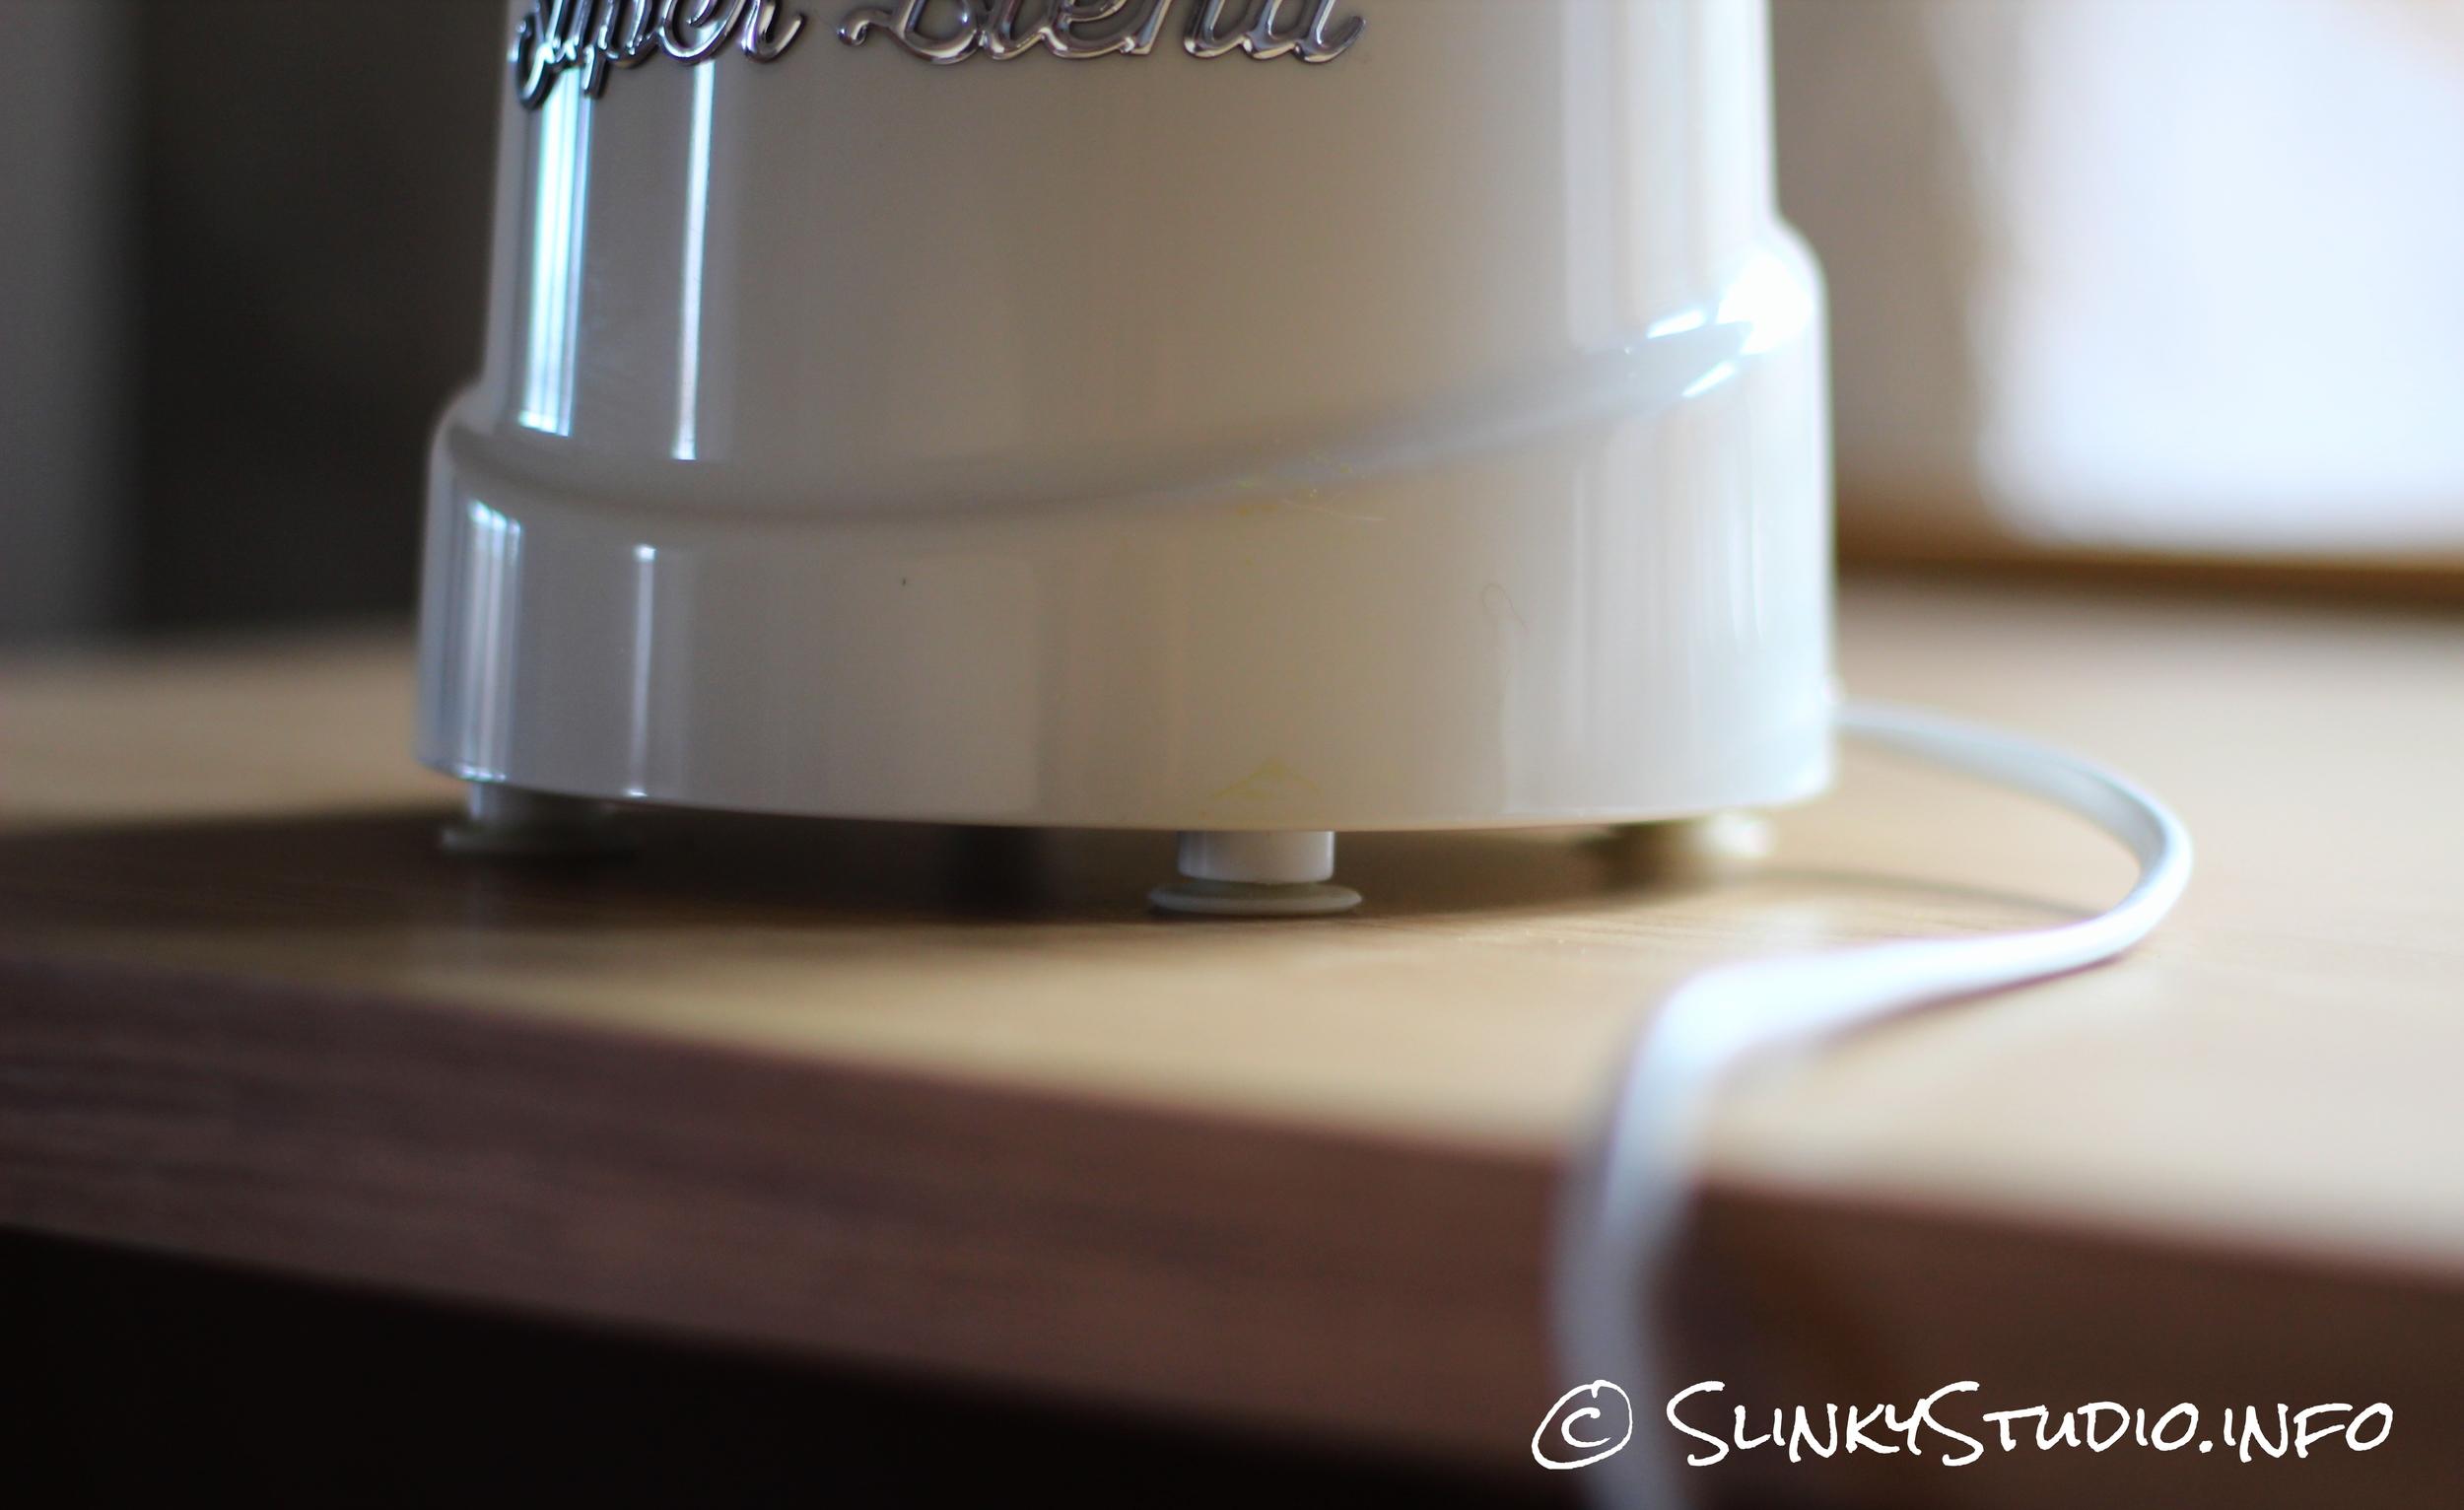 Retro Super Blend Blender Suction Grips on Base